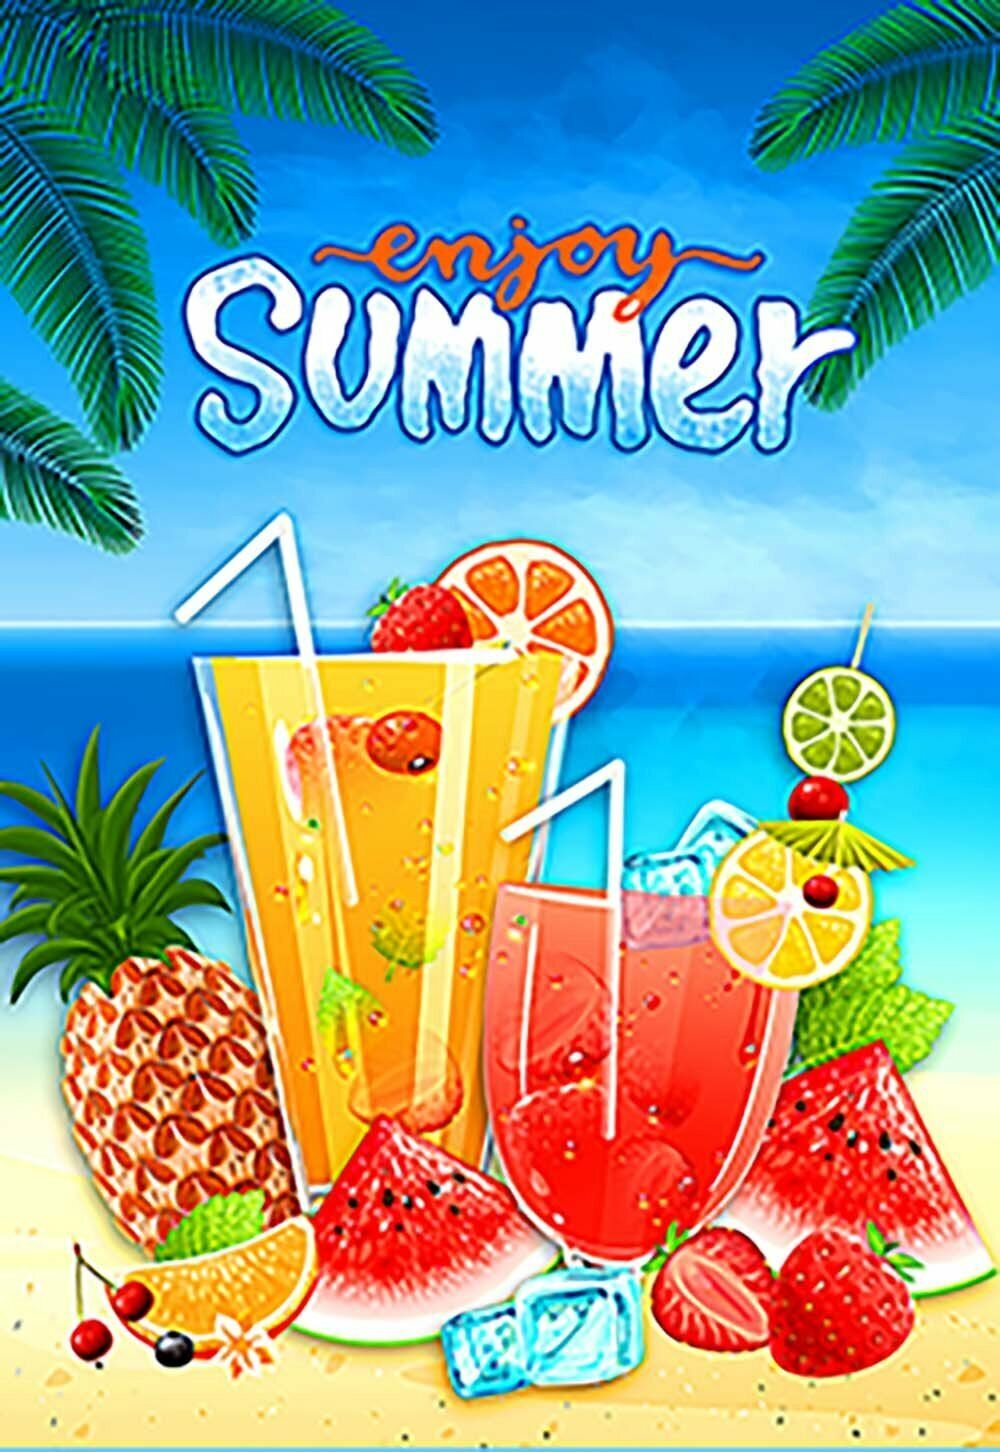 Morigins Enjoy Summer Decorative Fruit Juice Beach Party Sum